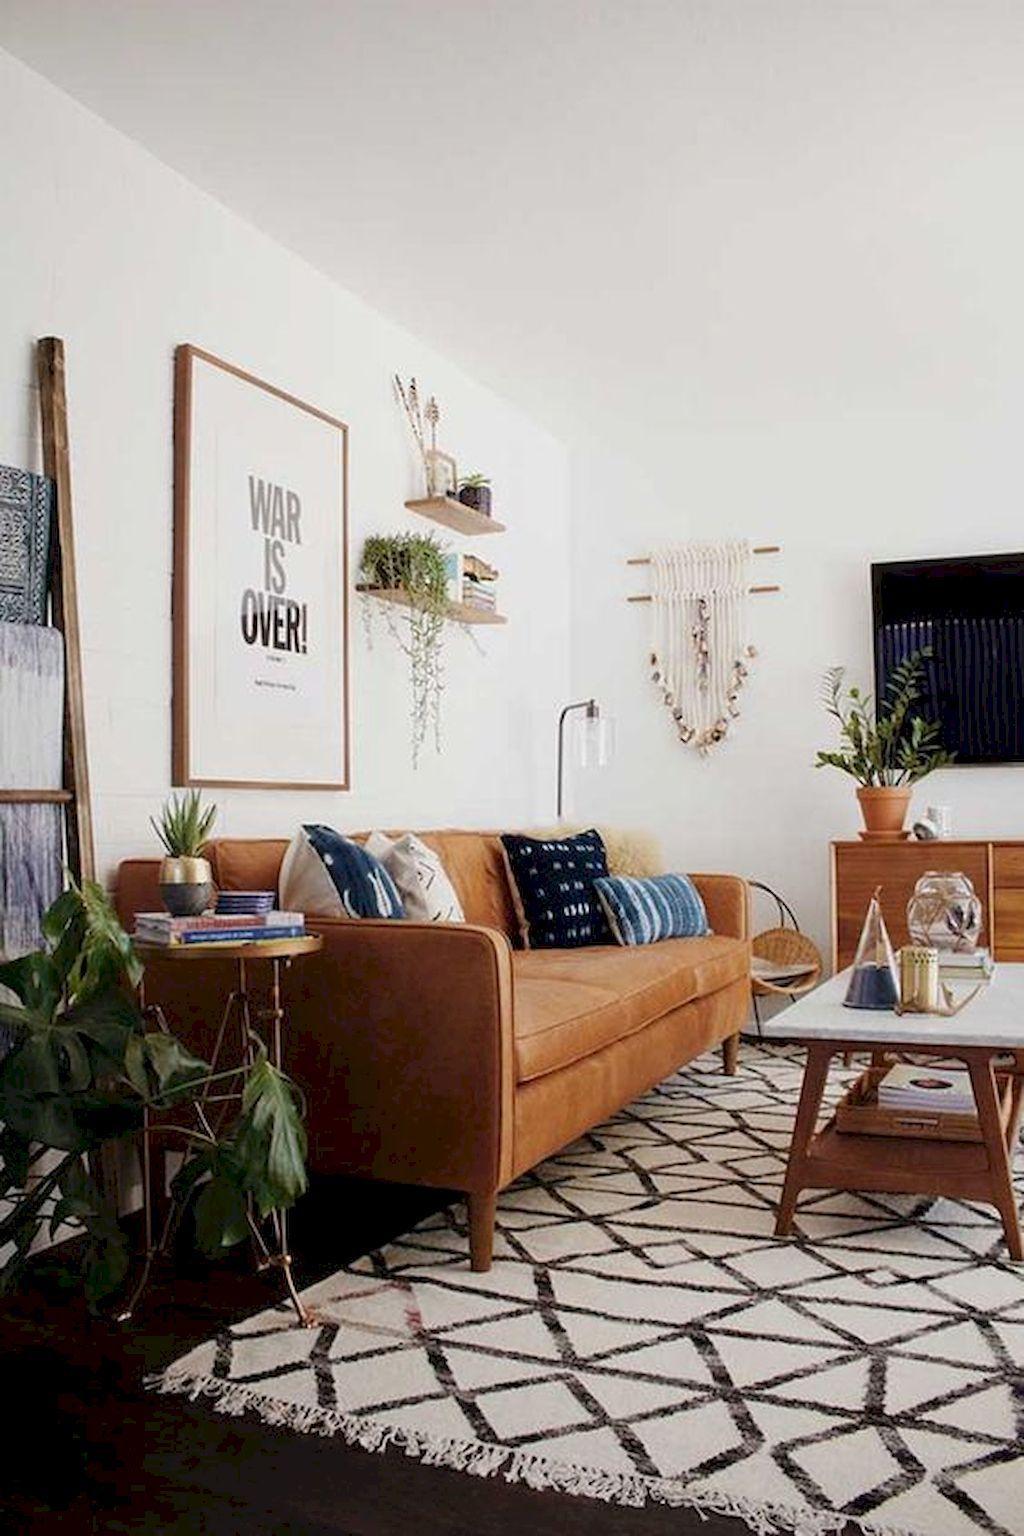 Modern bohemian home decor  Inspiration ideas for modern bohemian decorating interior